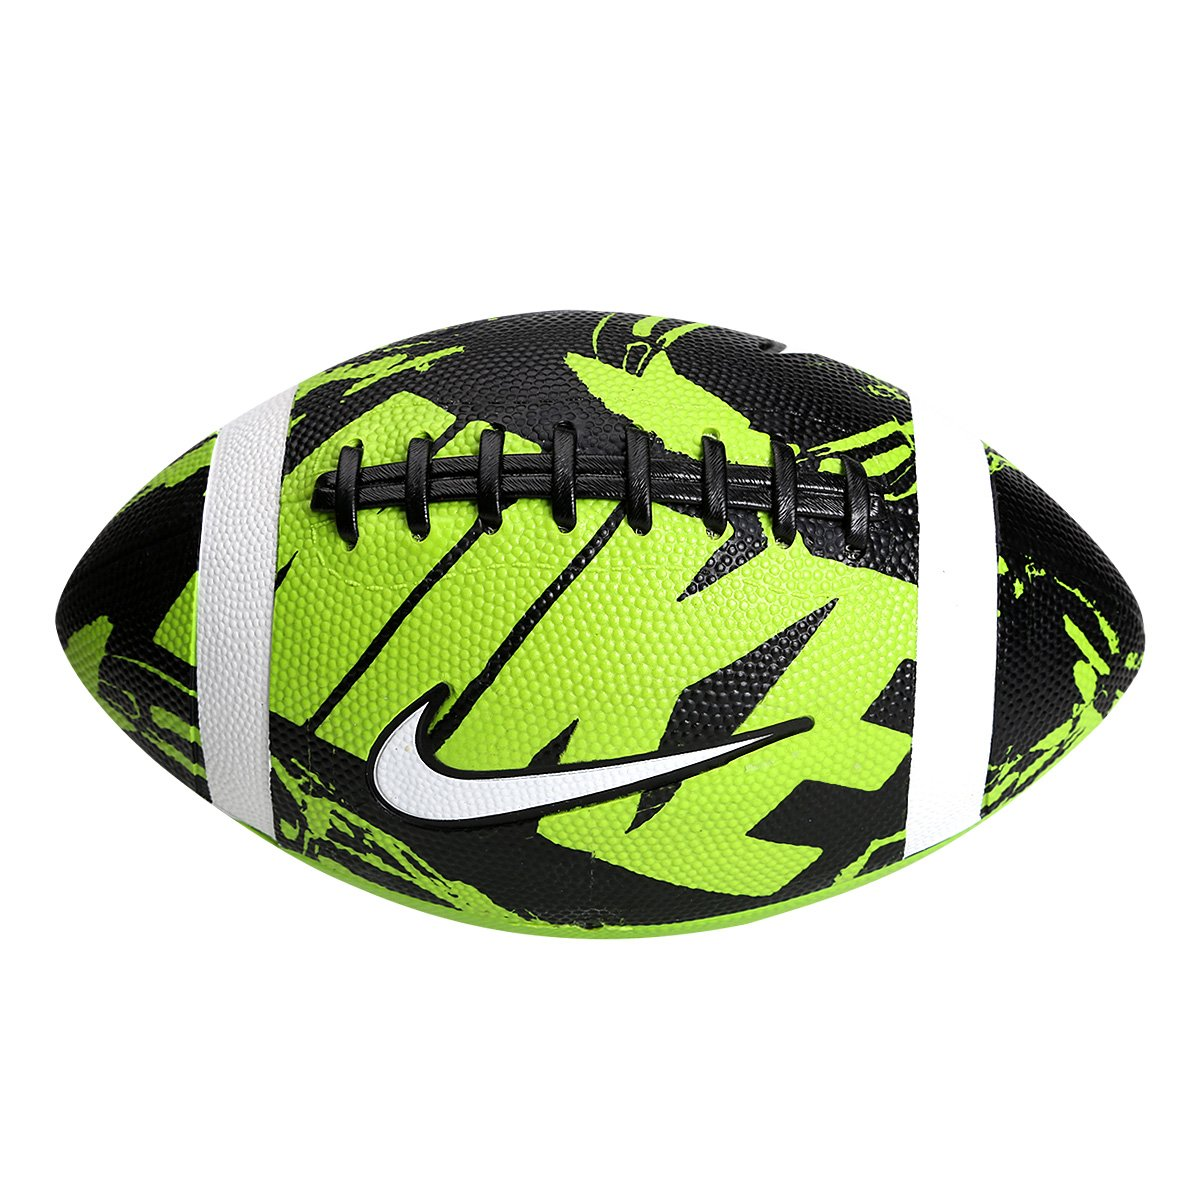 Bola de Futebol Americano Nike Spin 3.0 FB 9 Official 20613902213c0